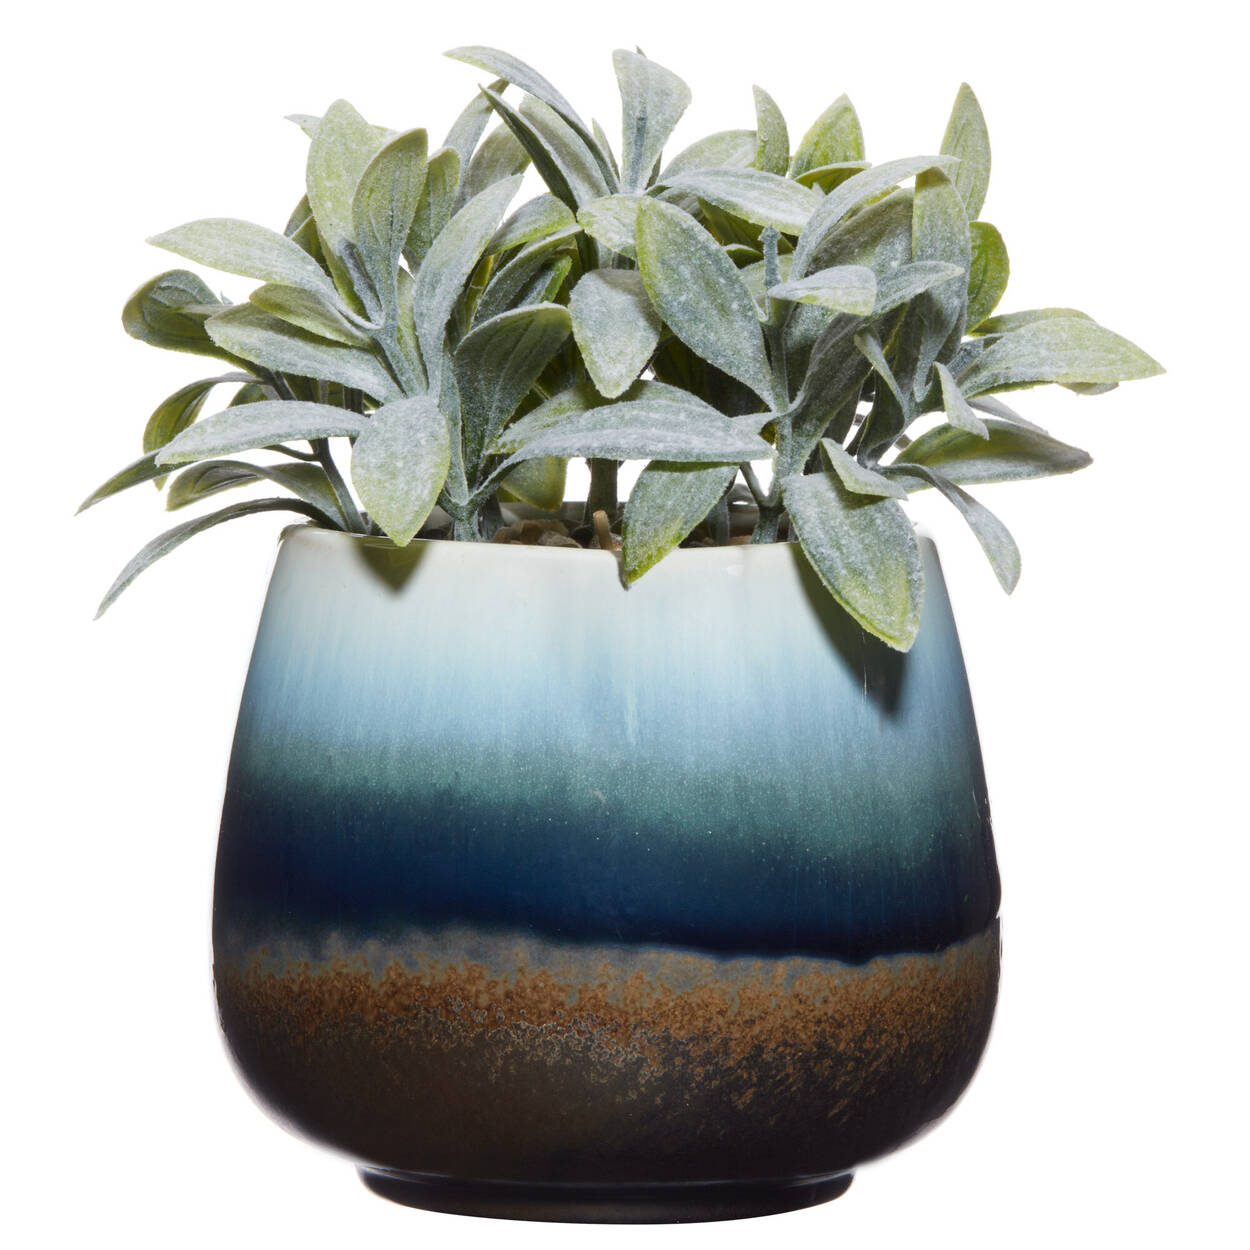 Plant in Reactive 3-Tone Ceramic Pot 12 x 15 cm.